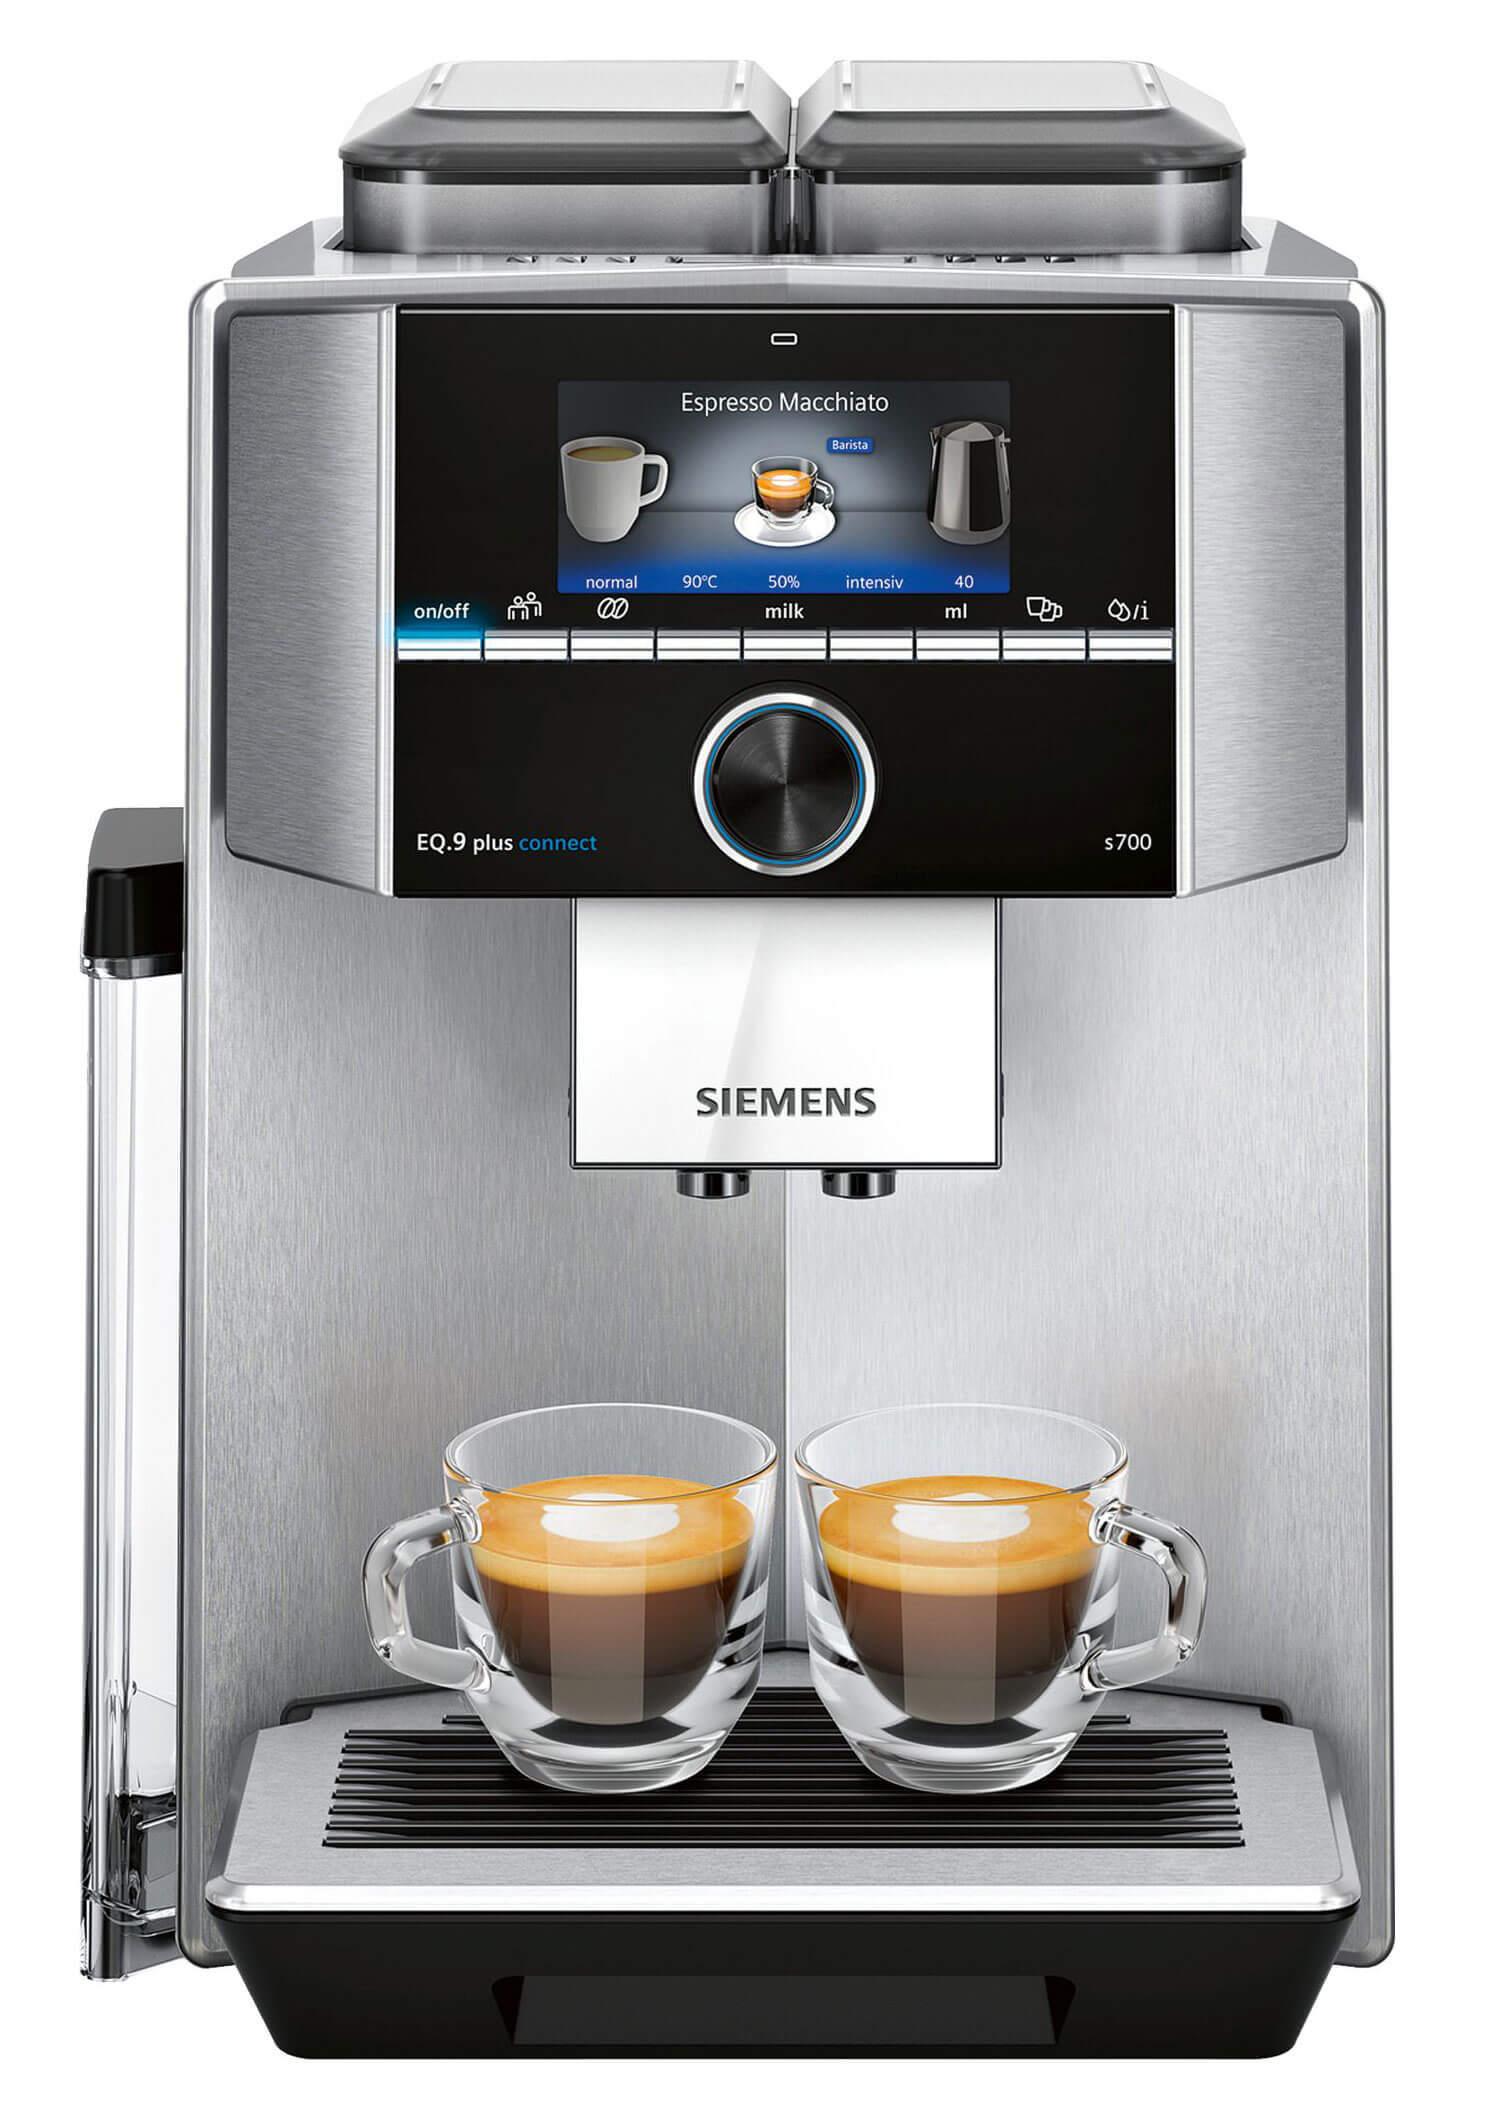 Siemens Kaffeevollautomat EQ9 plus connect S700 | Kamasega